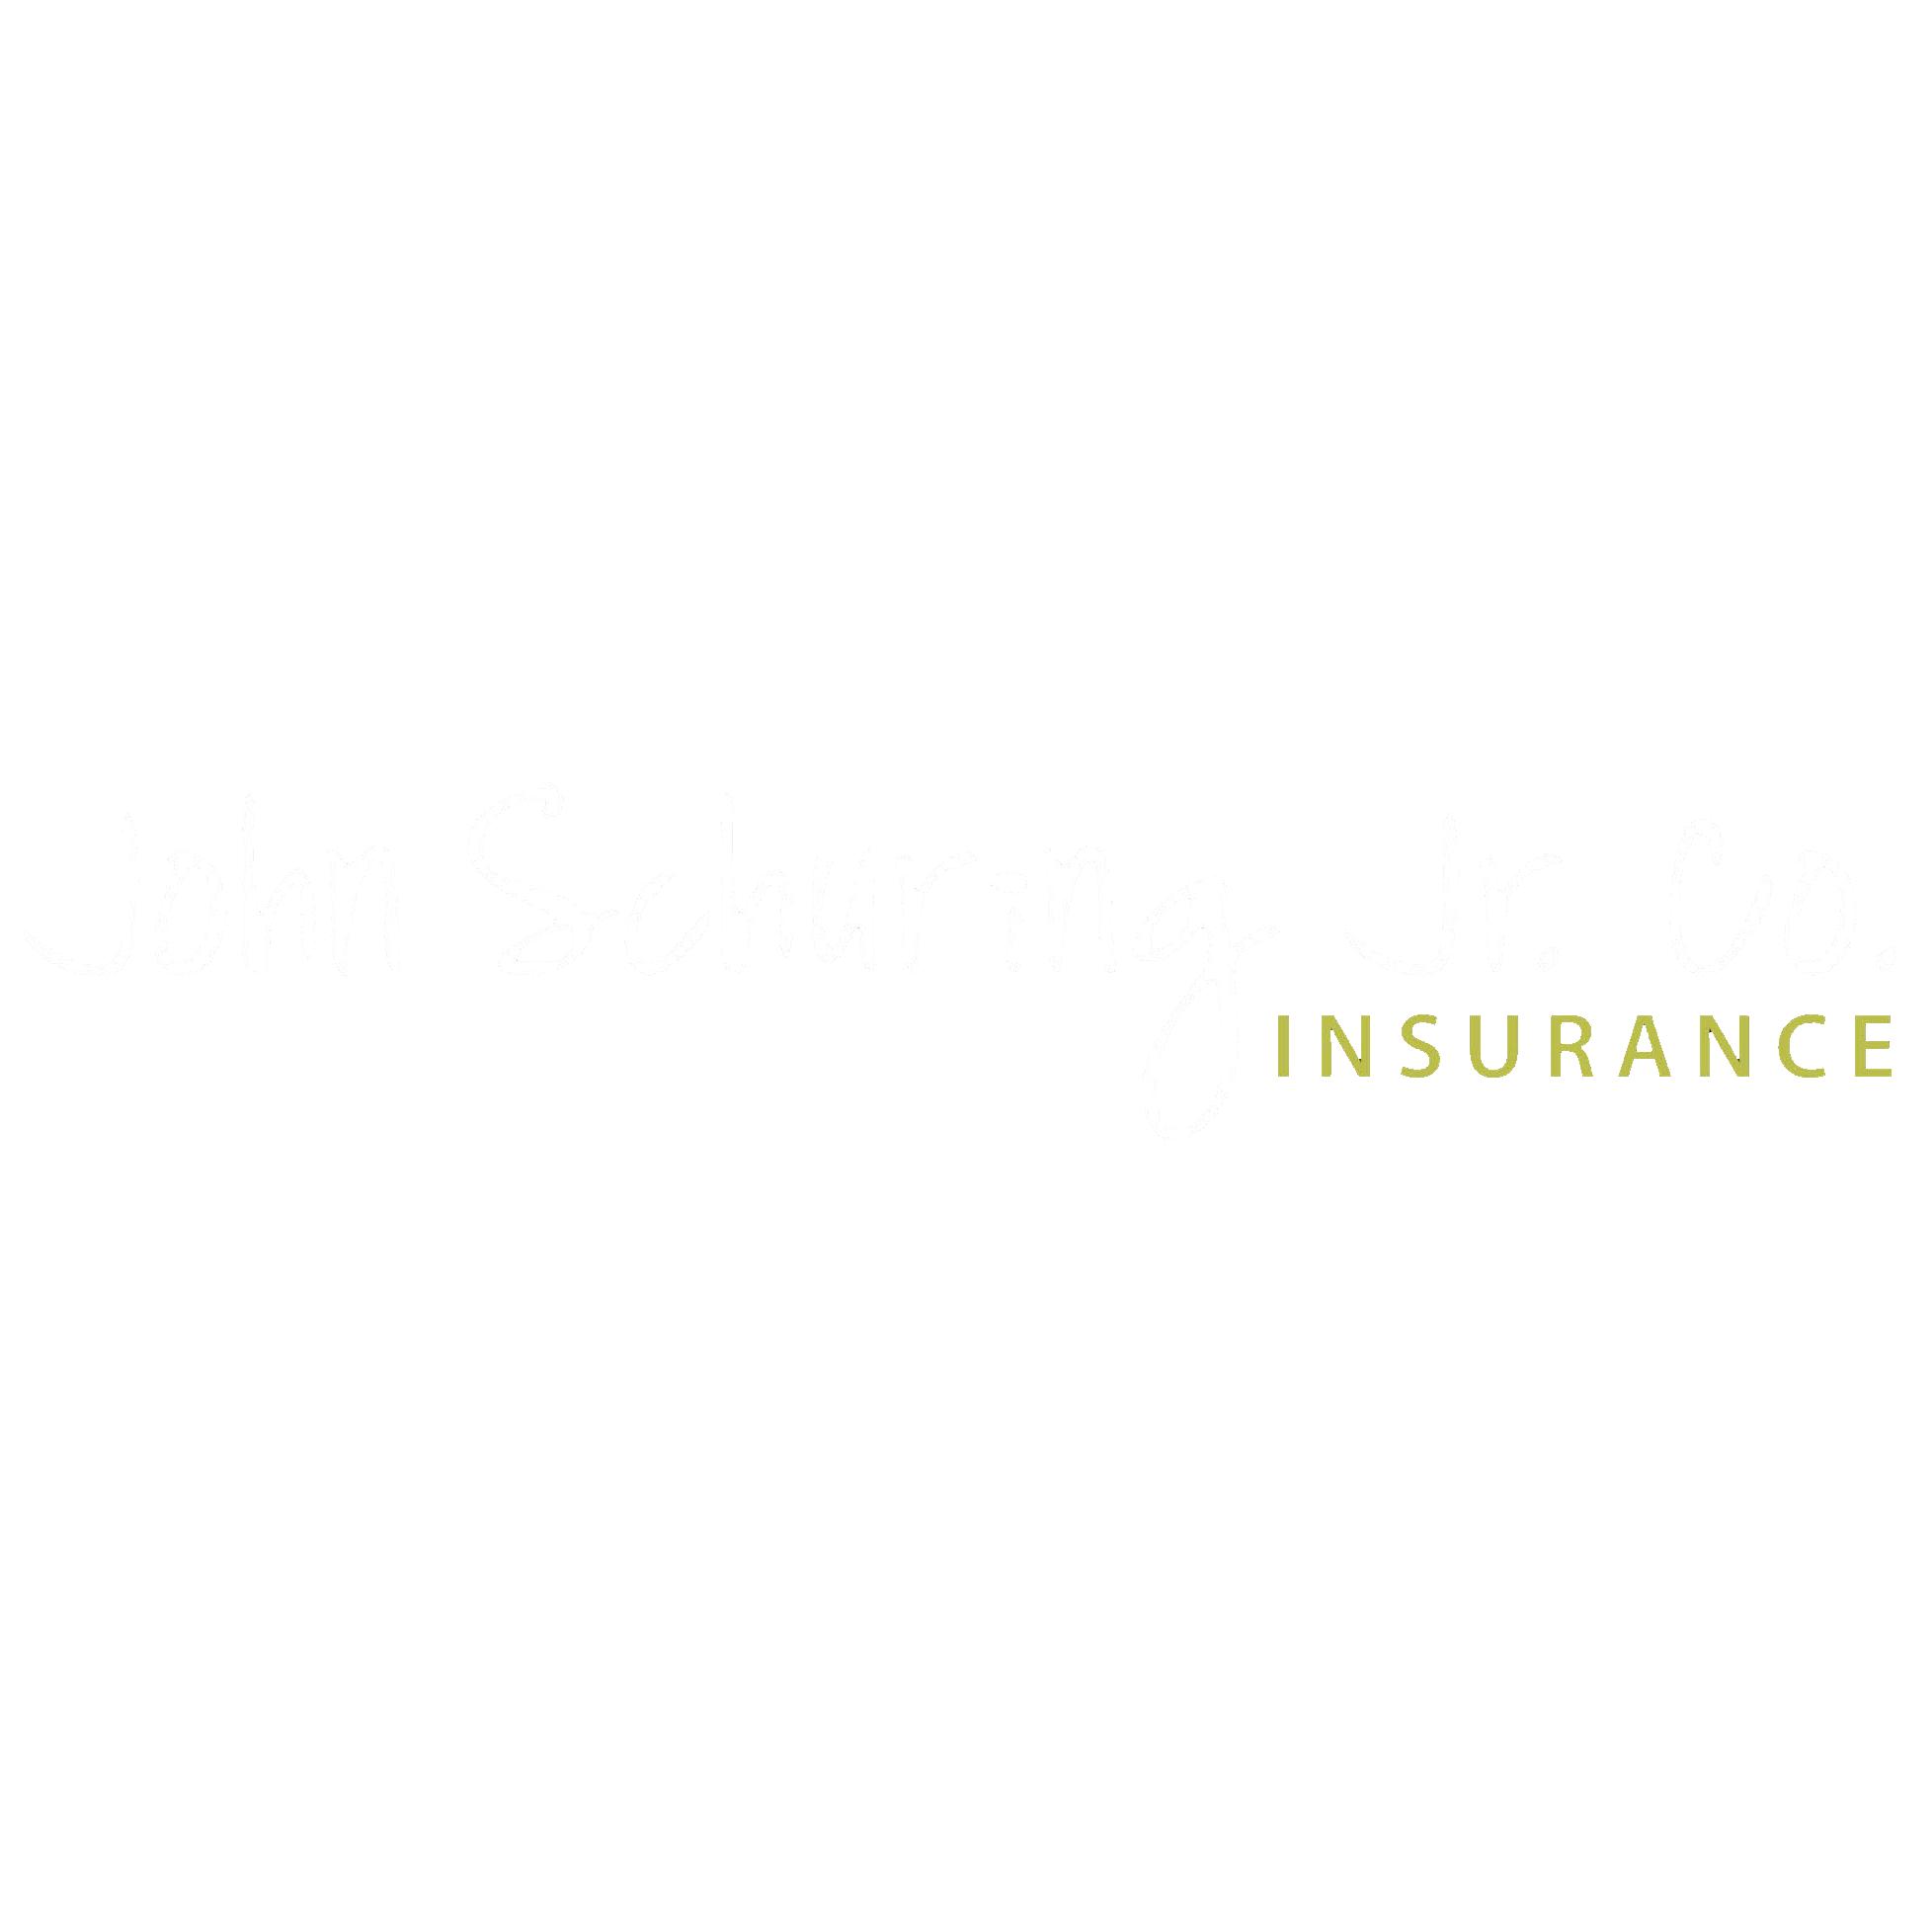 John Schuring Jr. Company Insurance